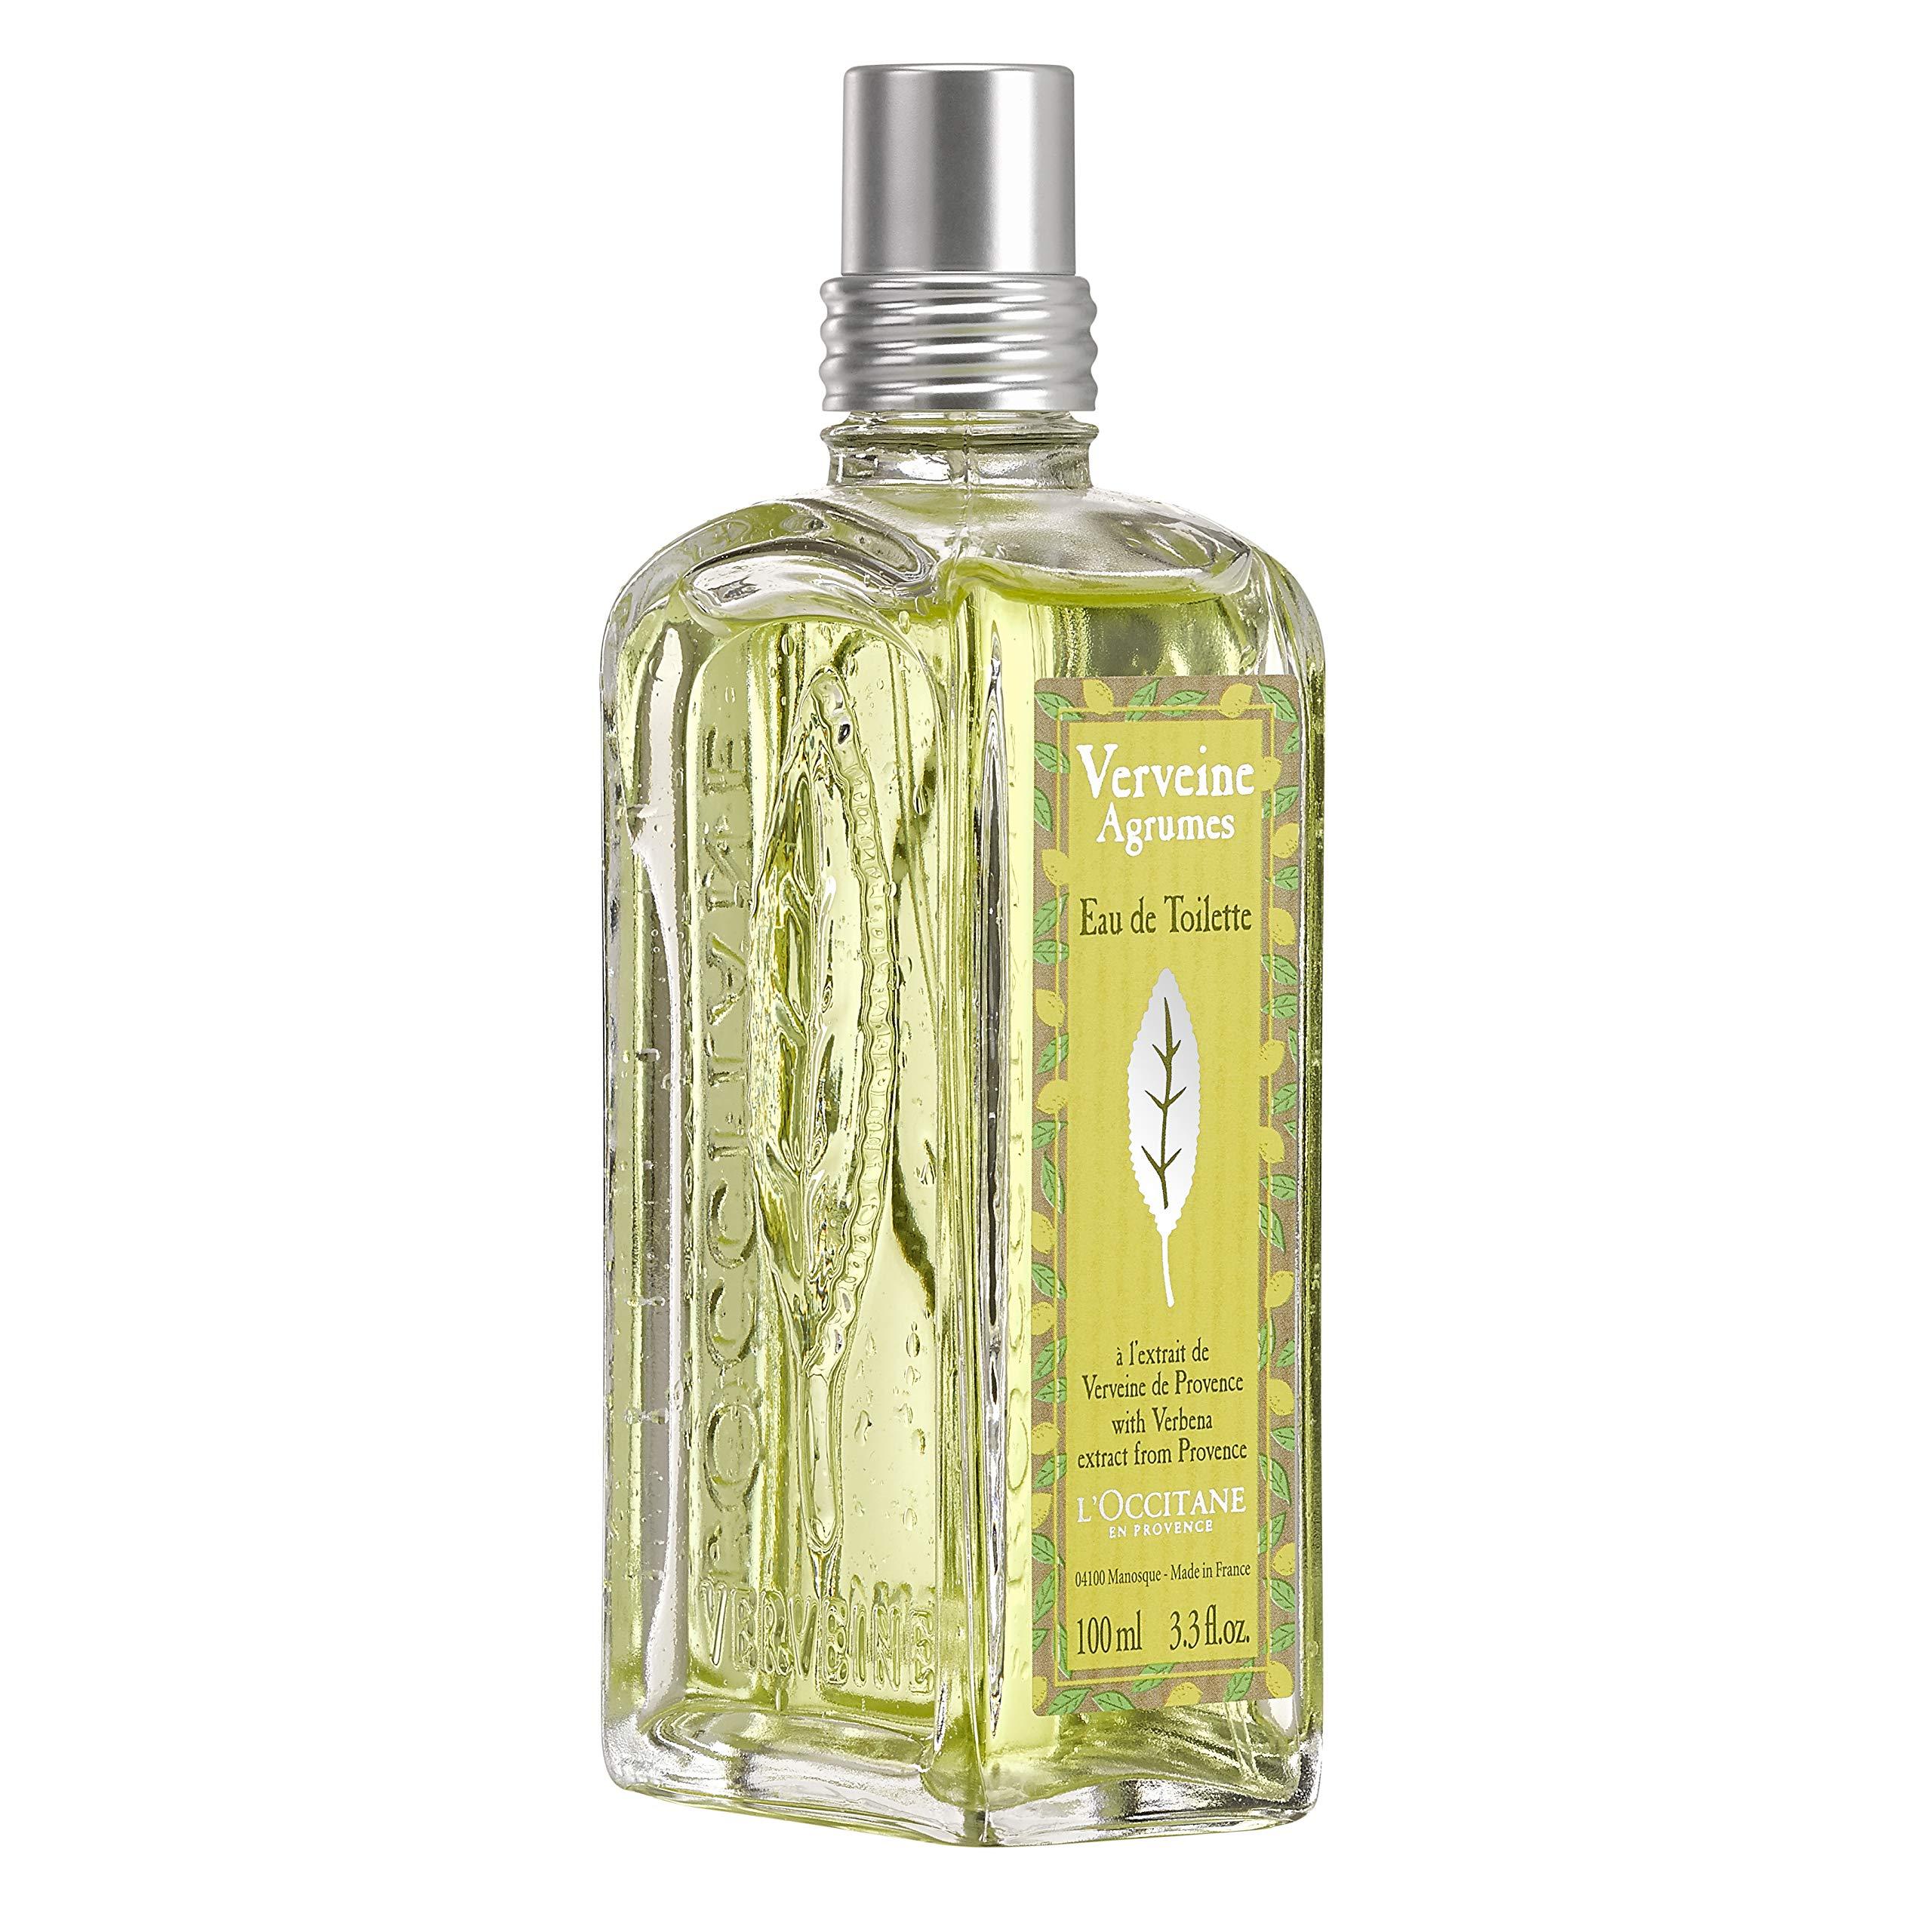 L'Occitane Crisp Citrus Verbena Eau de Toilette Spray, 3.3 Fl. oz.